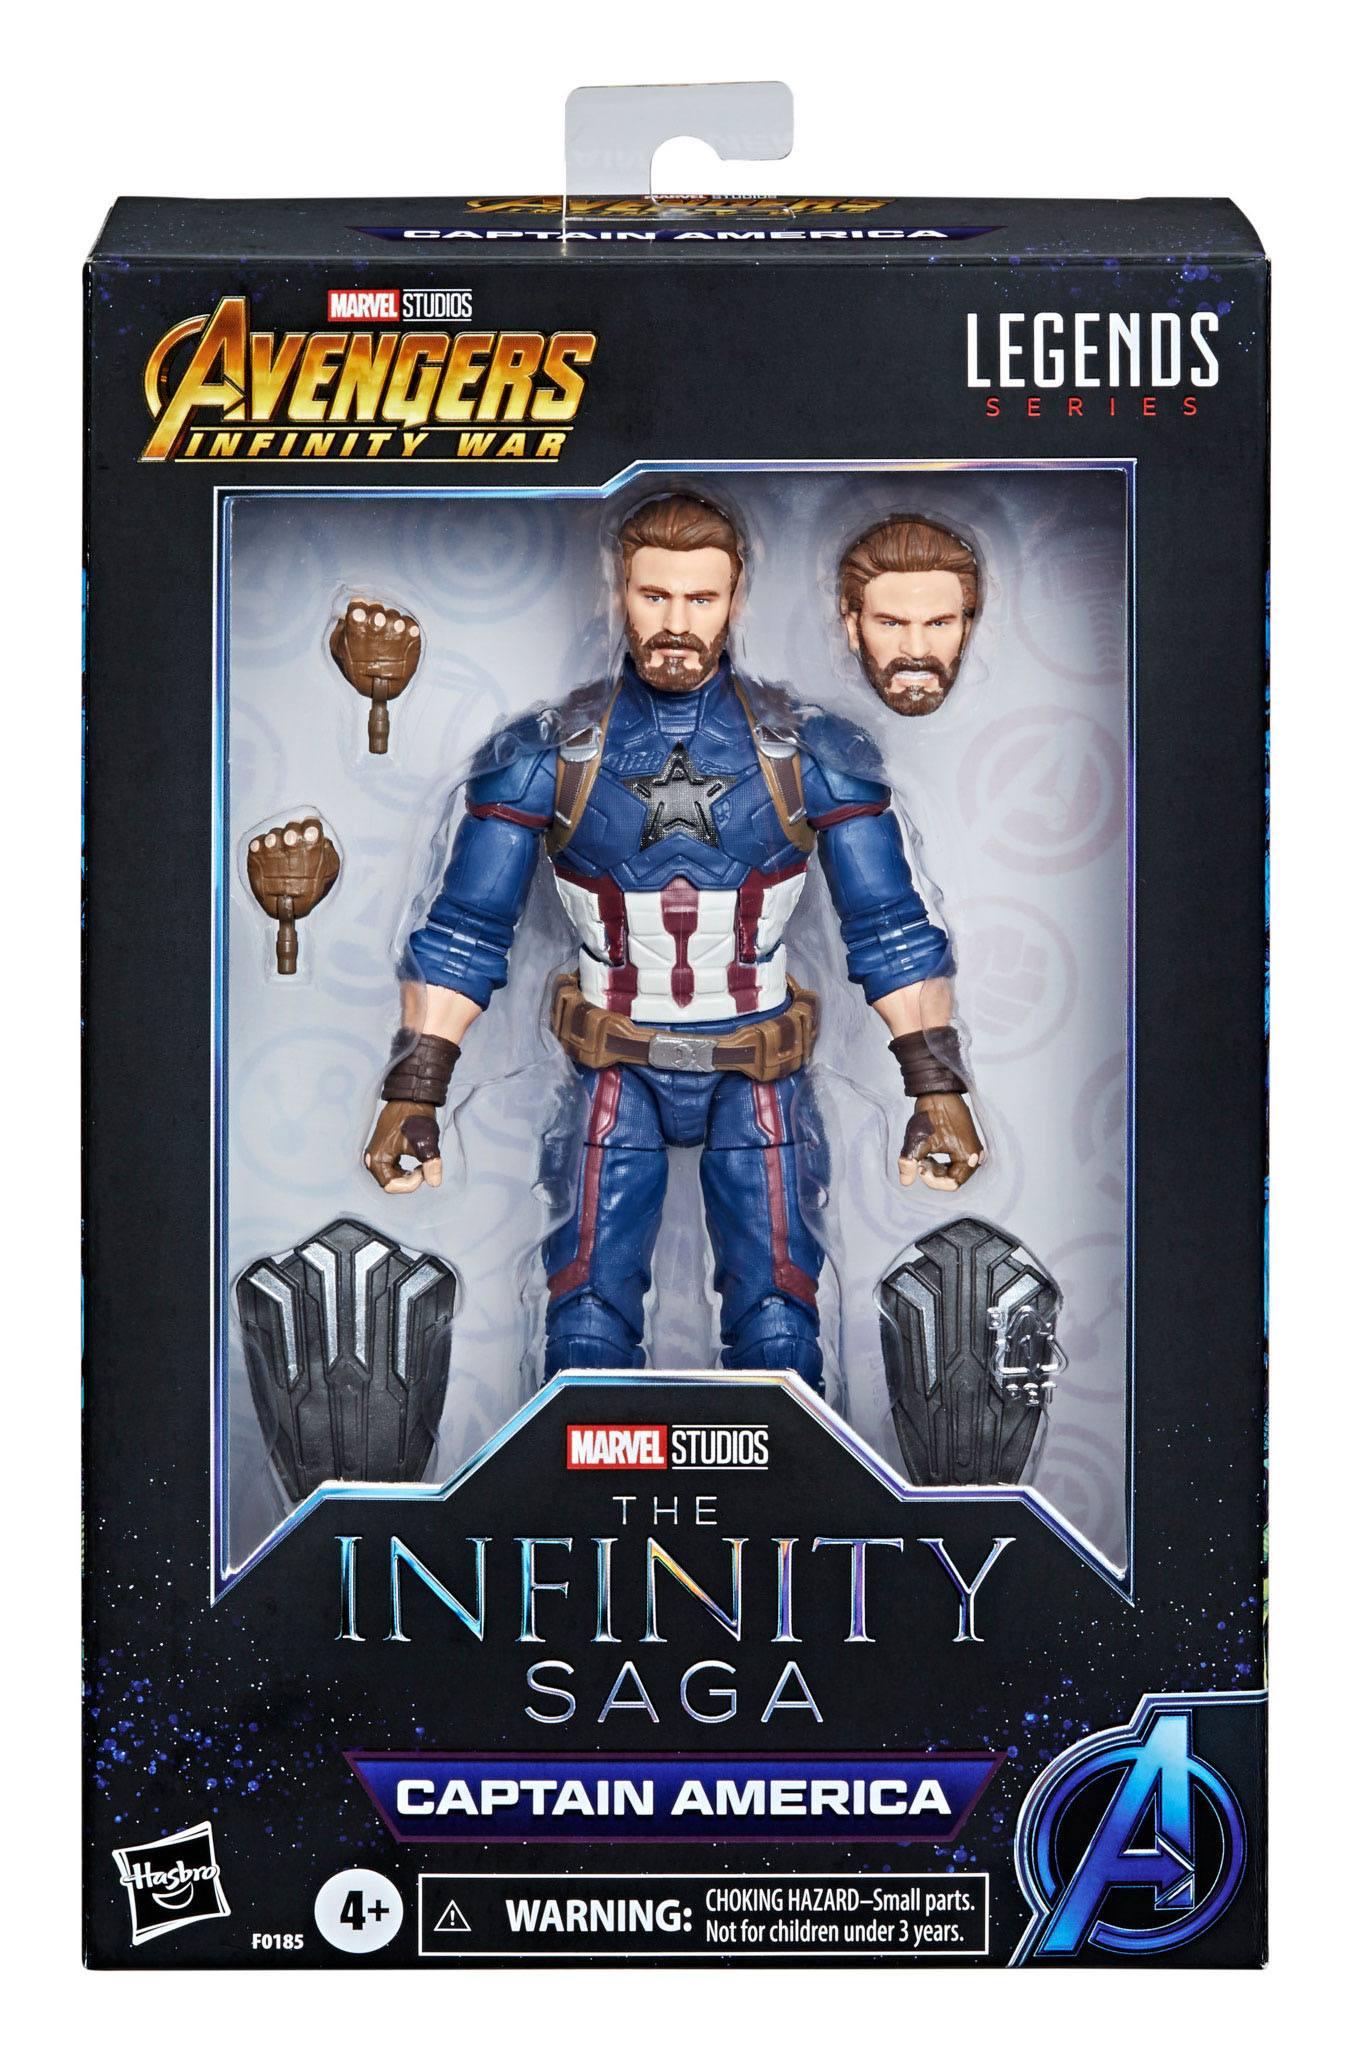 The Infinity Saga Marvel Legends Actionfigur 2021 Captain America (Avengers: Infinity War) 15 cm F01855L0 5010993839360